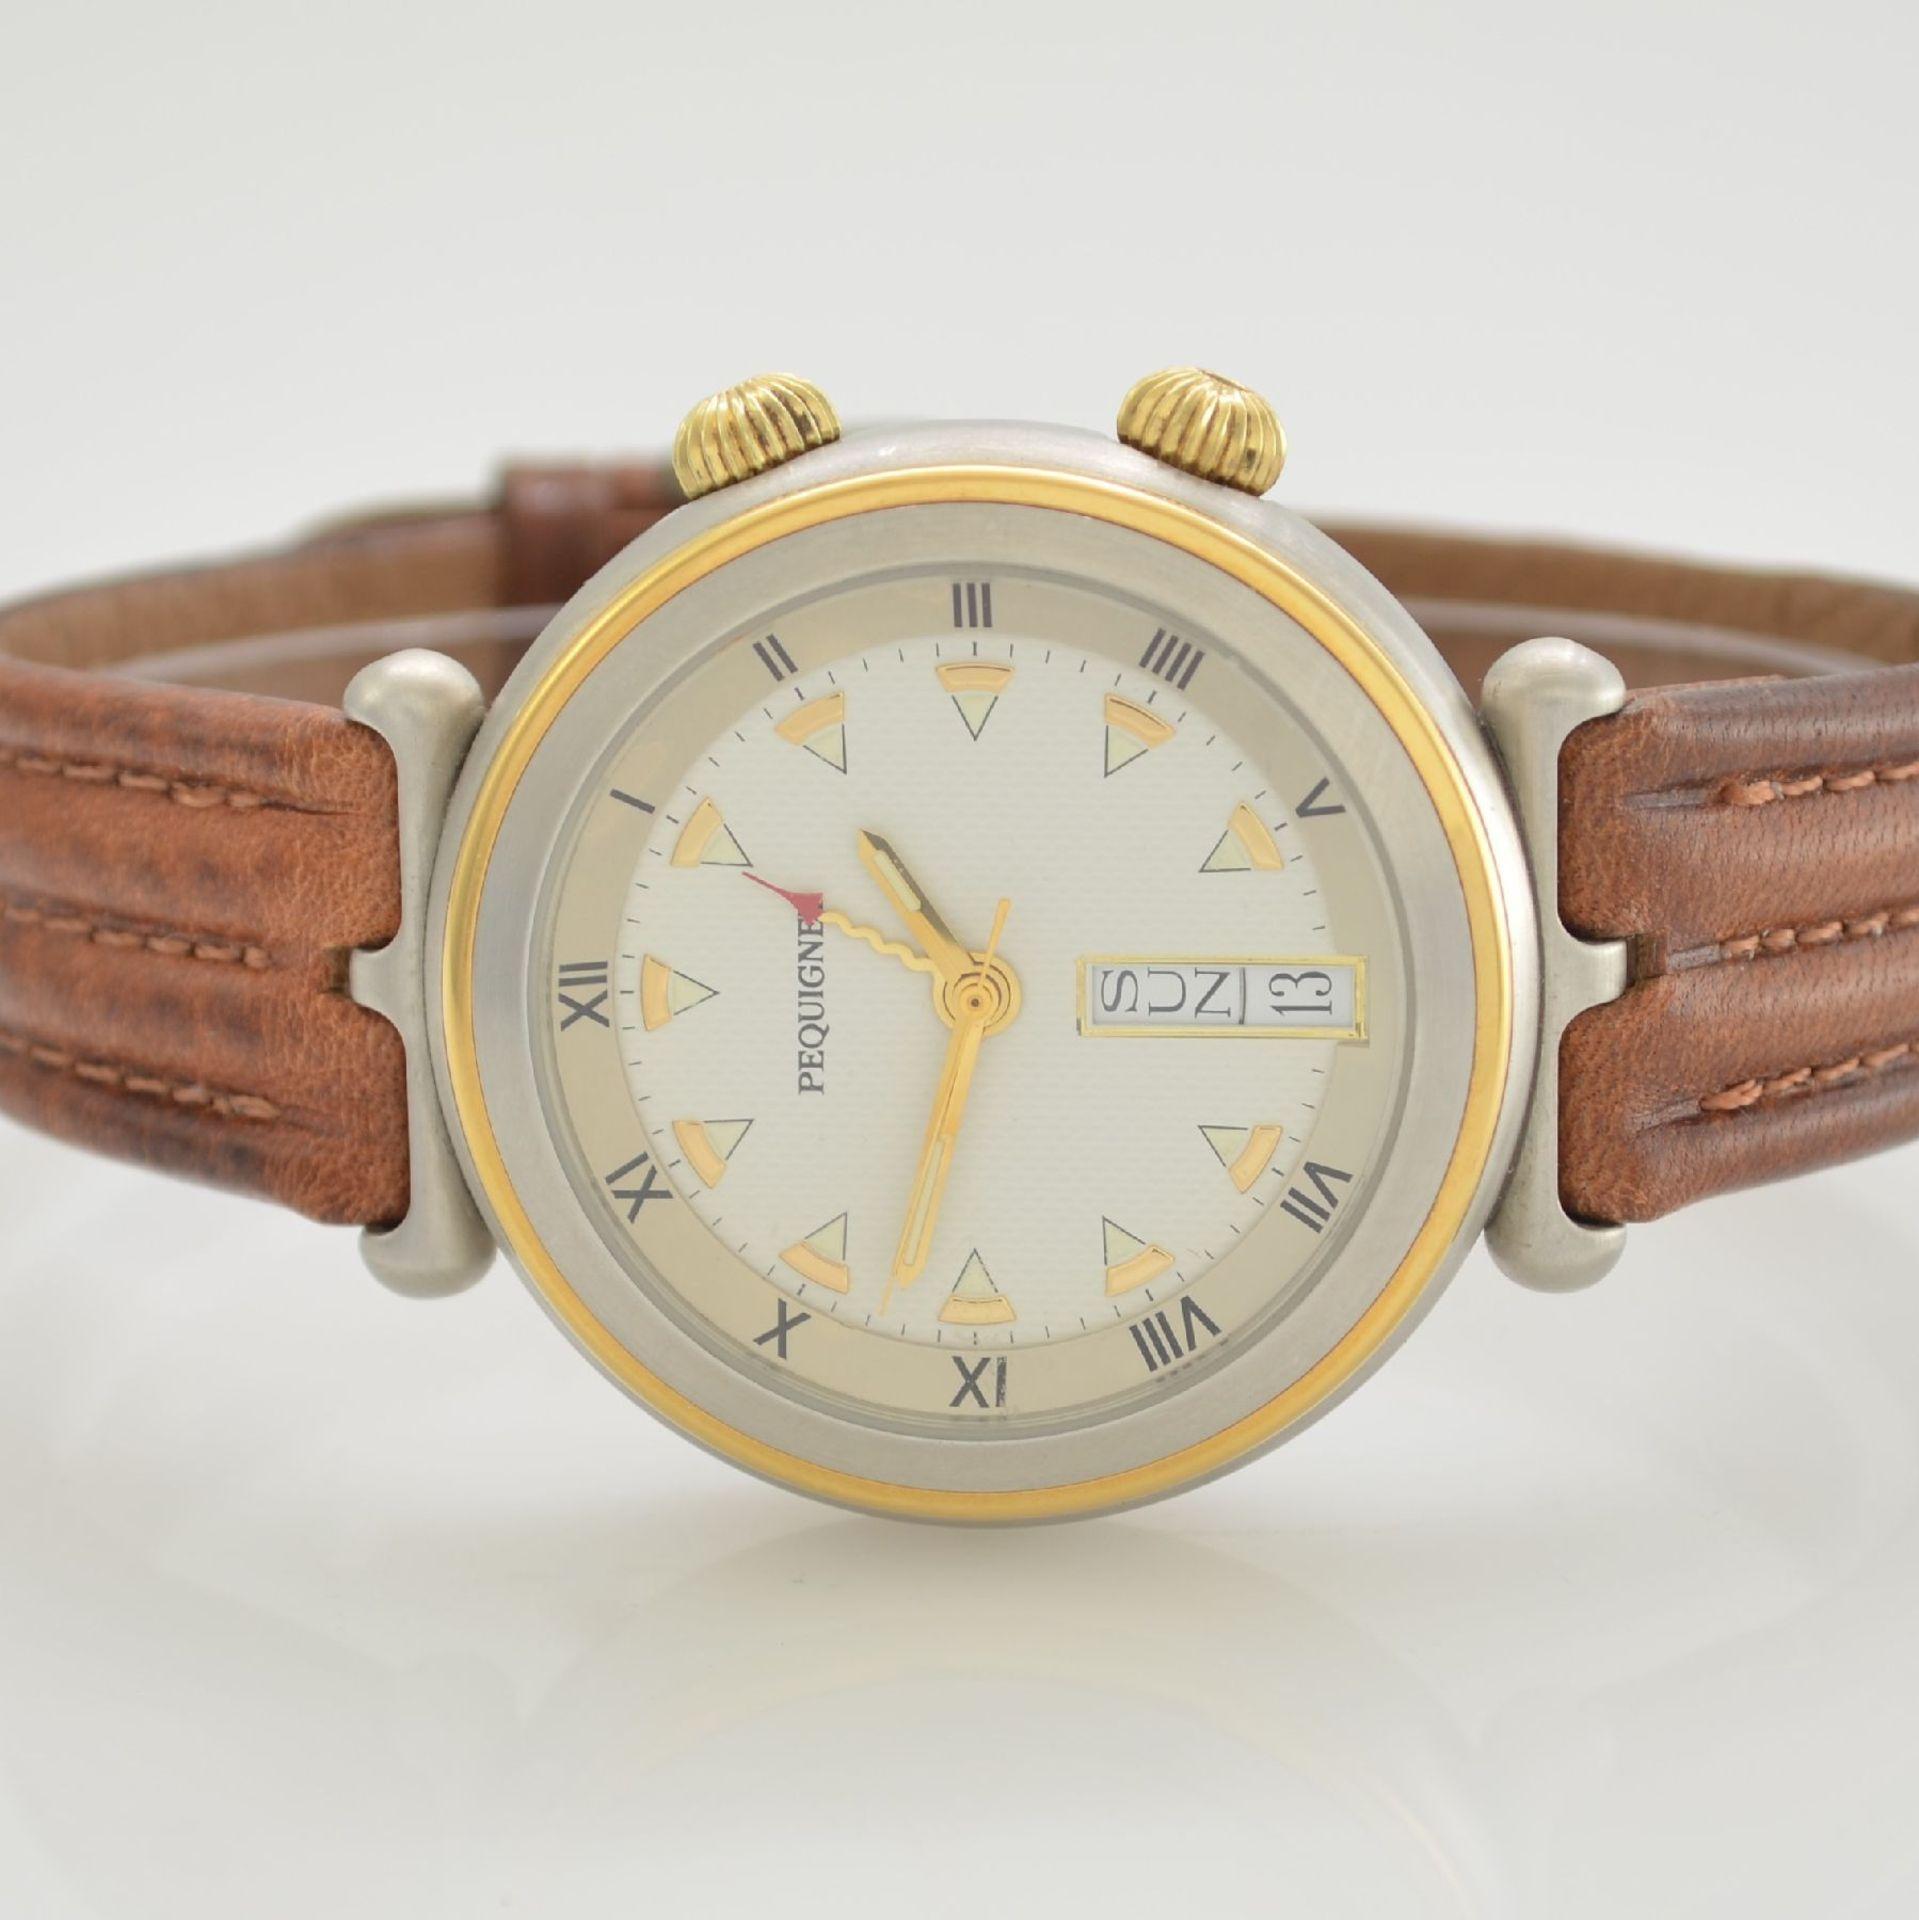 BUCHERER Chronometer Herrenarmbanduhr Archimedes in Edelstahl, Automatik, Gliederband m. dopp. - Bild 2 aus 7